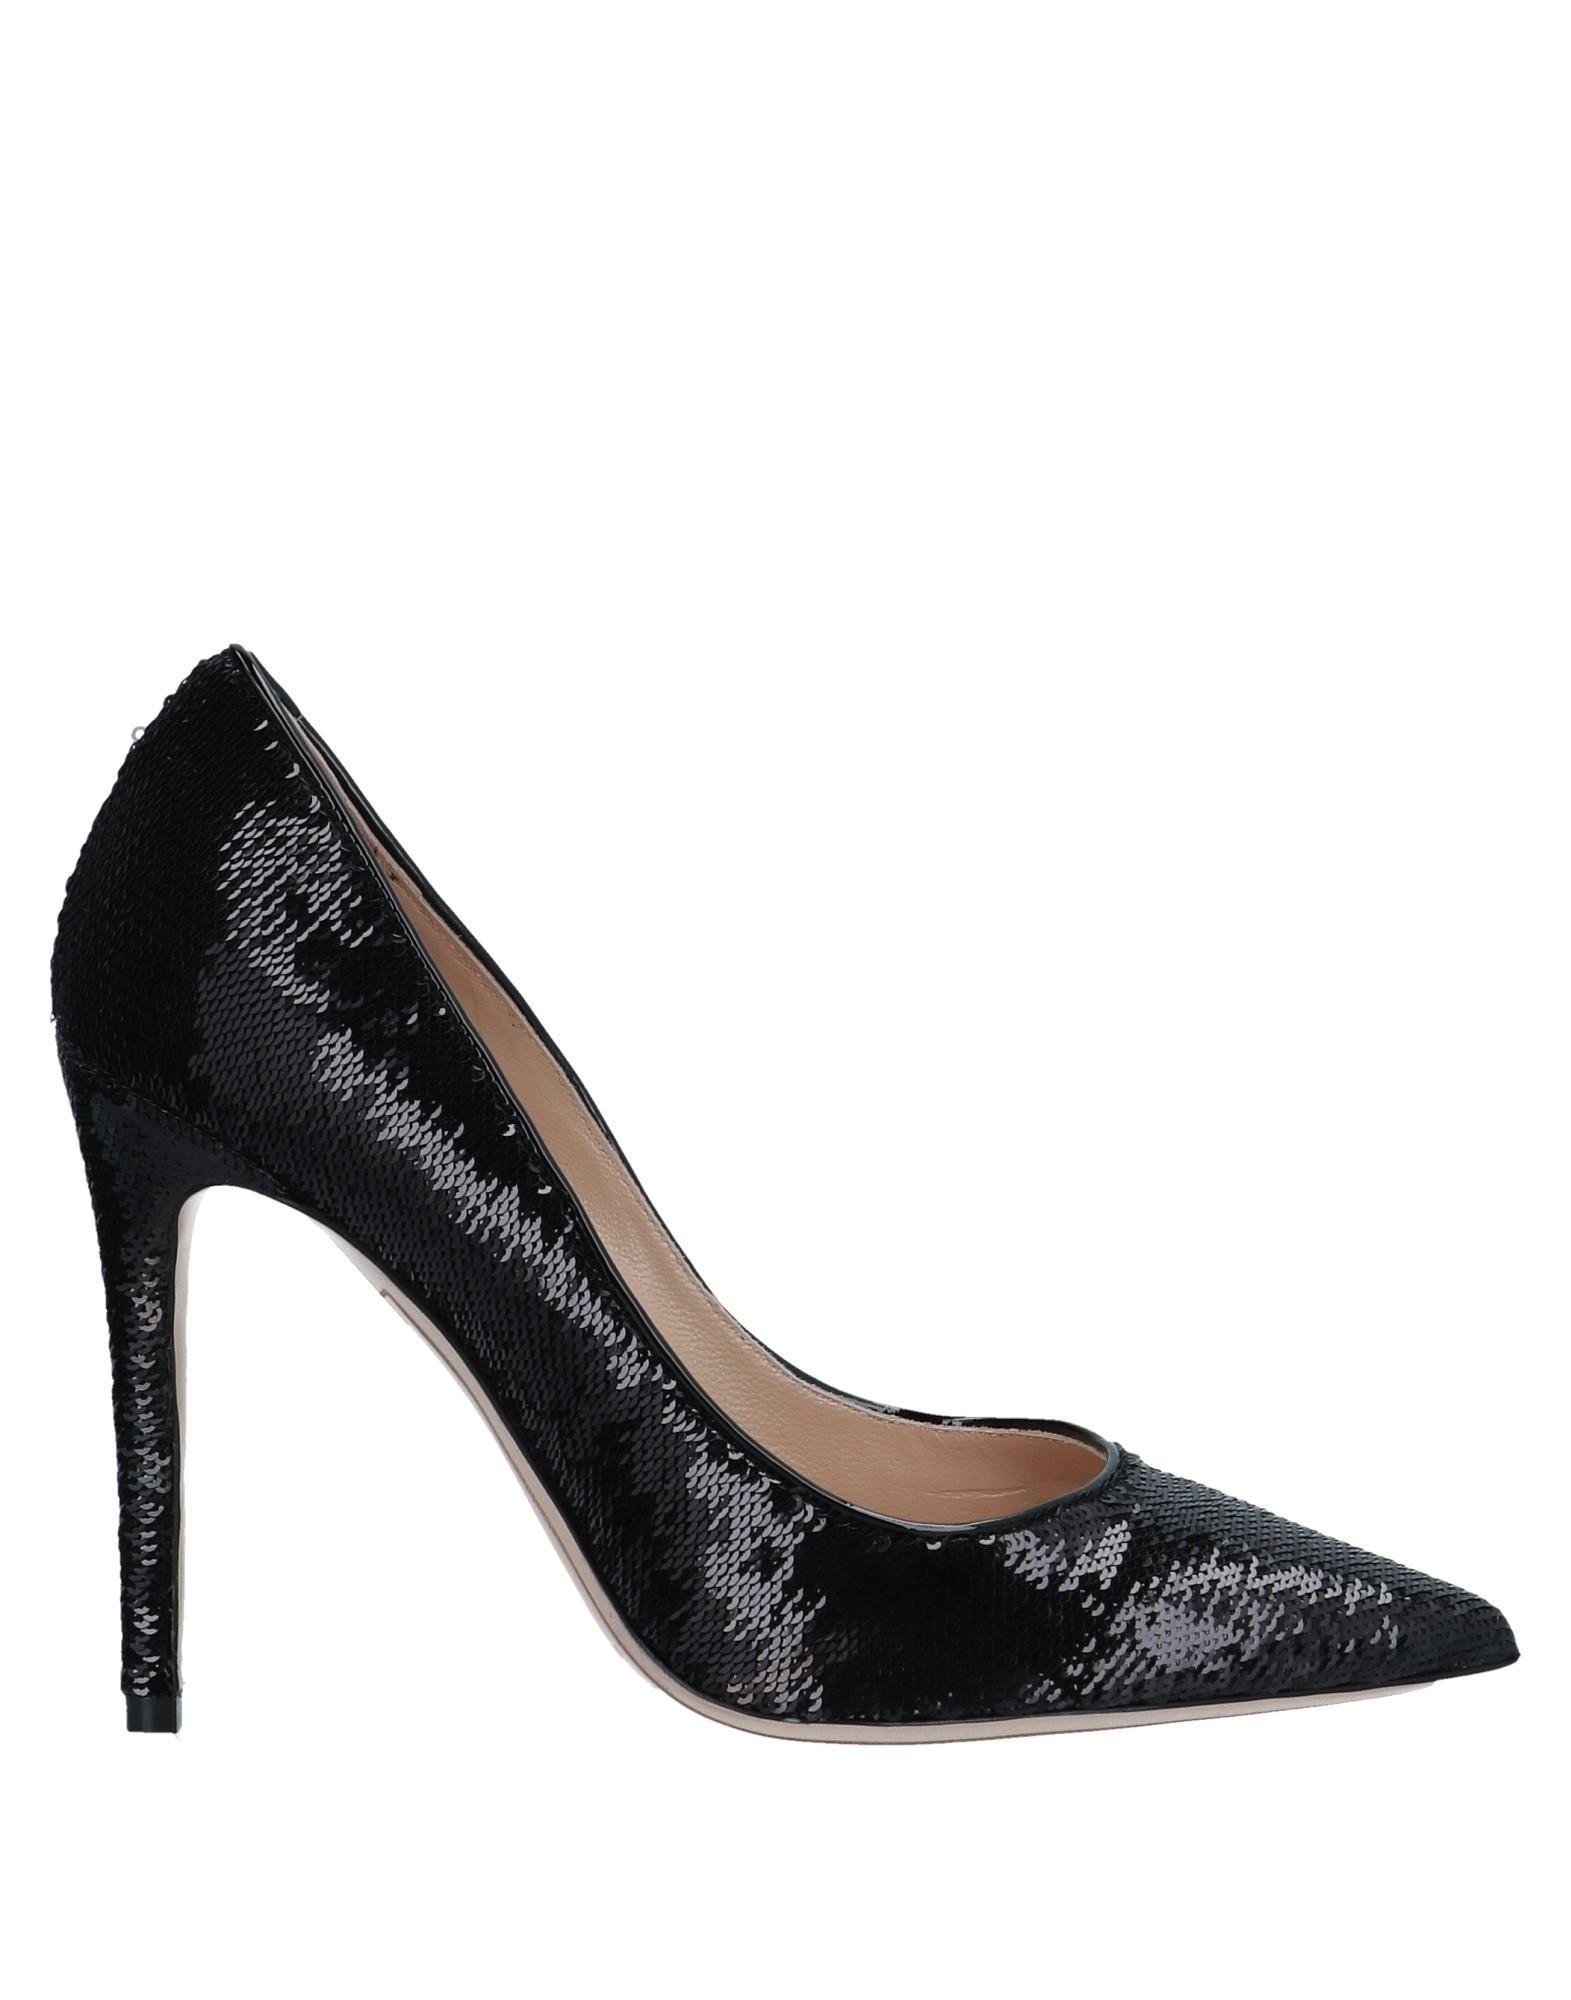 Stilvolle billige Pumps Schuhe Deimille Pumps billige Damen  11556330DI 0e824b